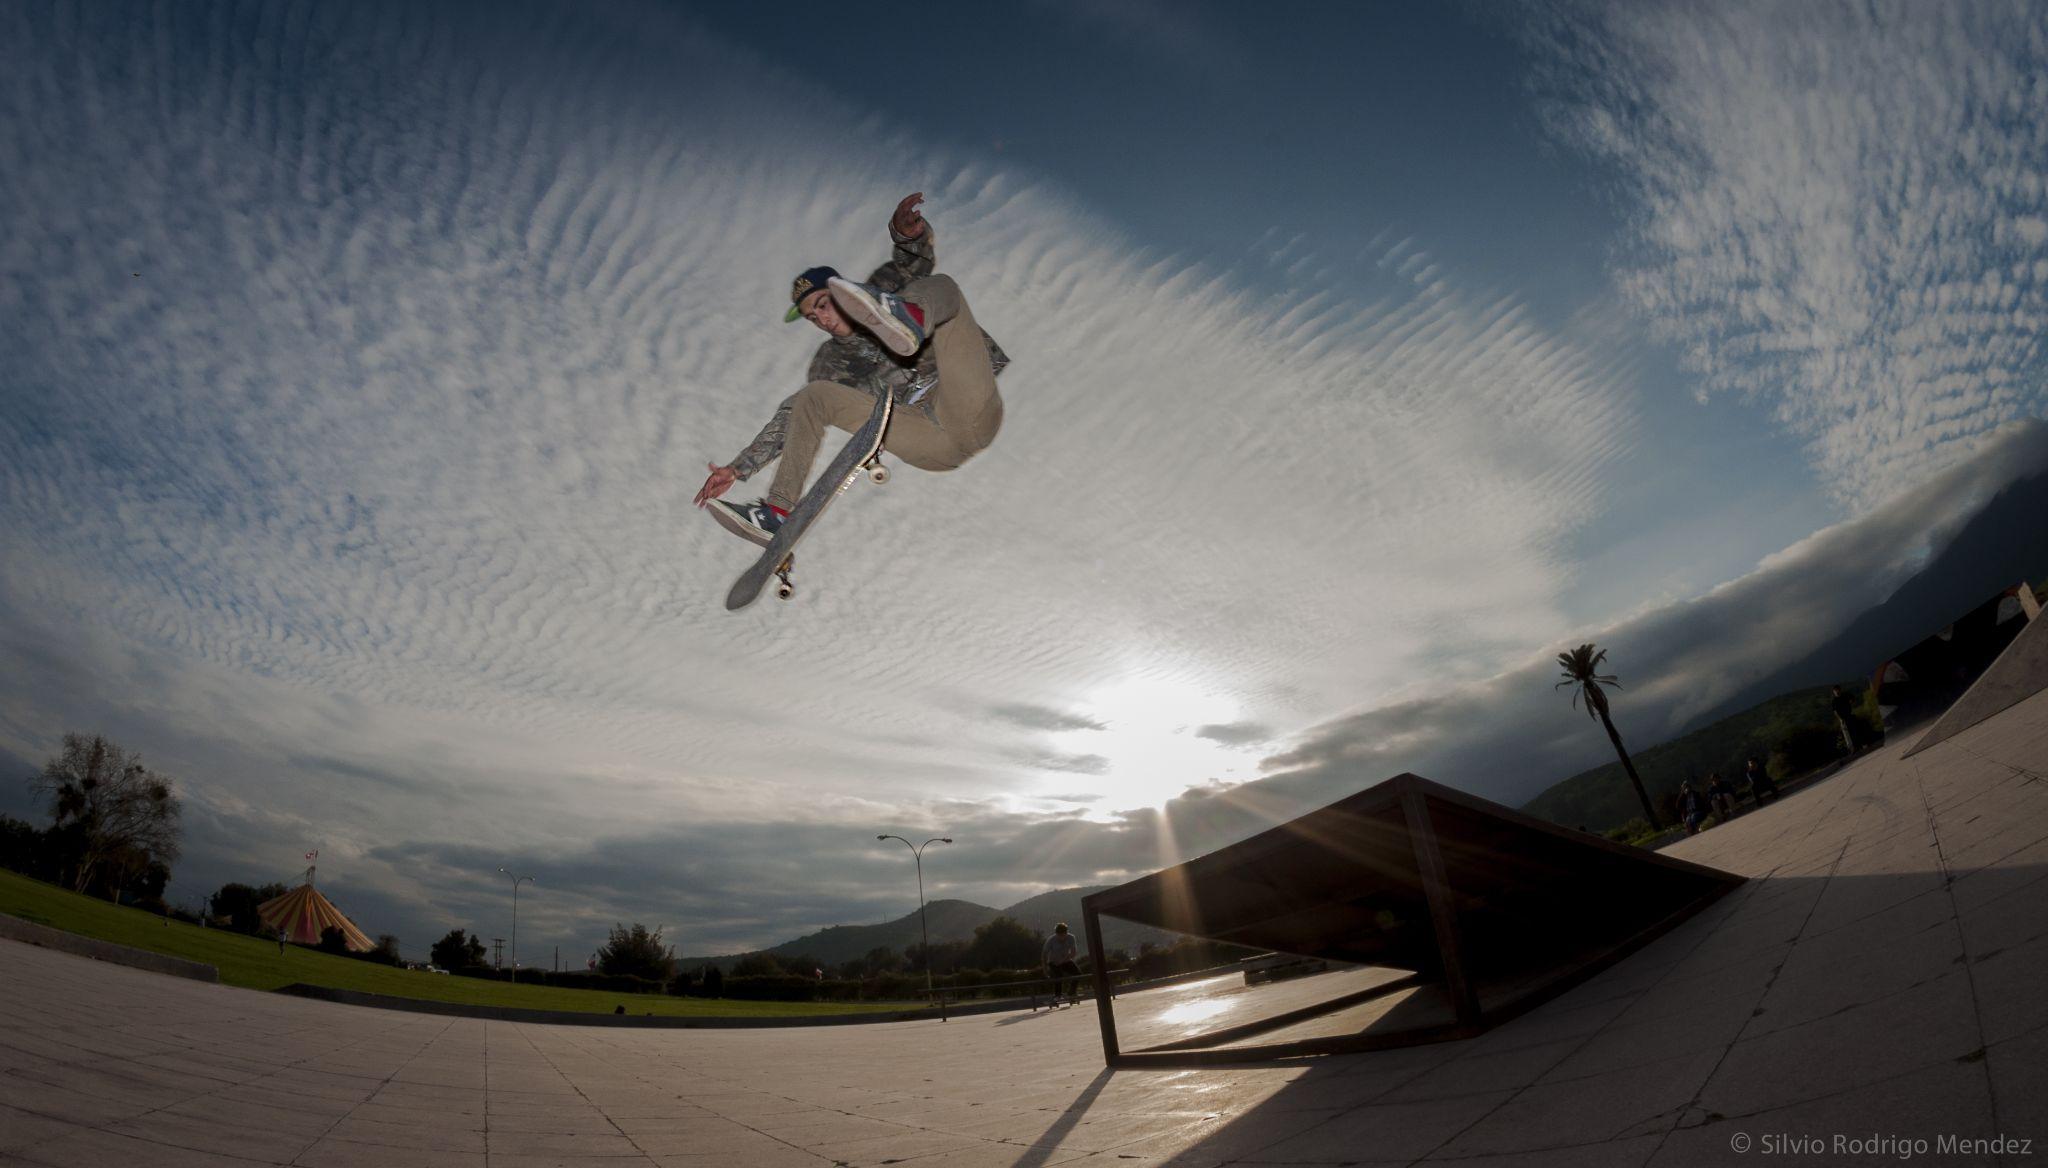 Rafael Galaz - Kickflip frontside - Quillota, Chile by Silvio Rodrigo Mendez